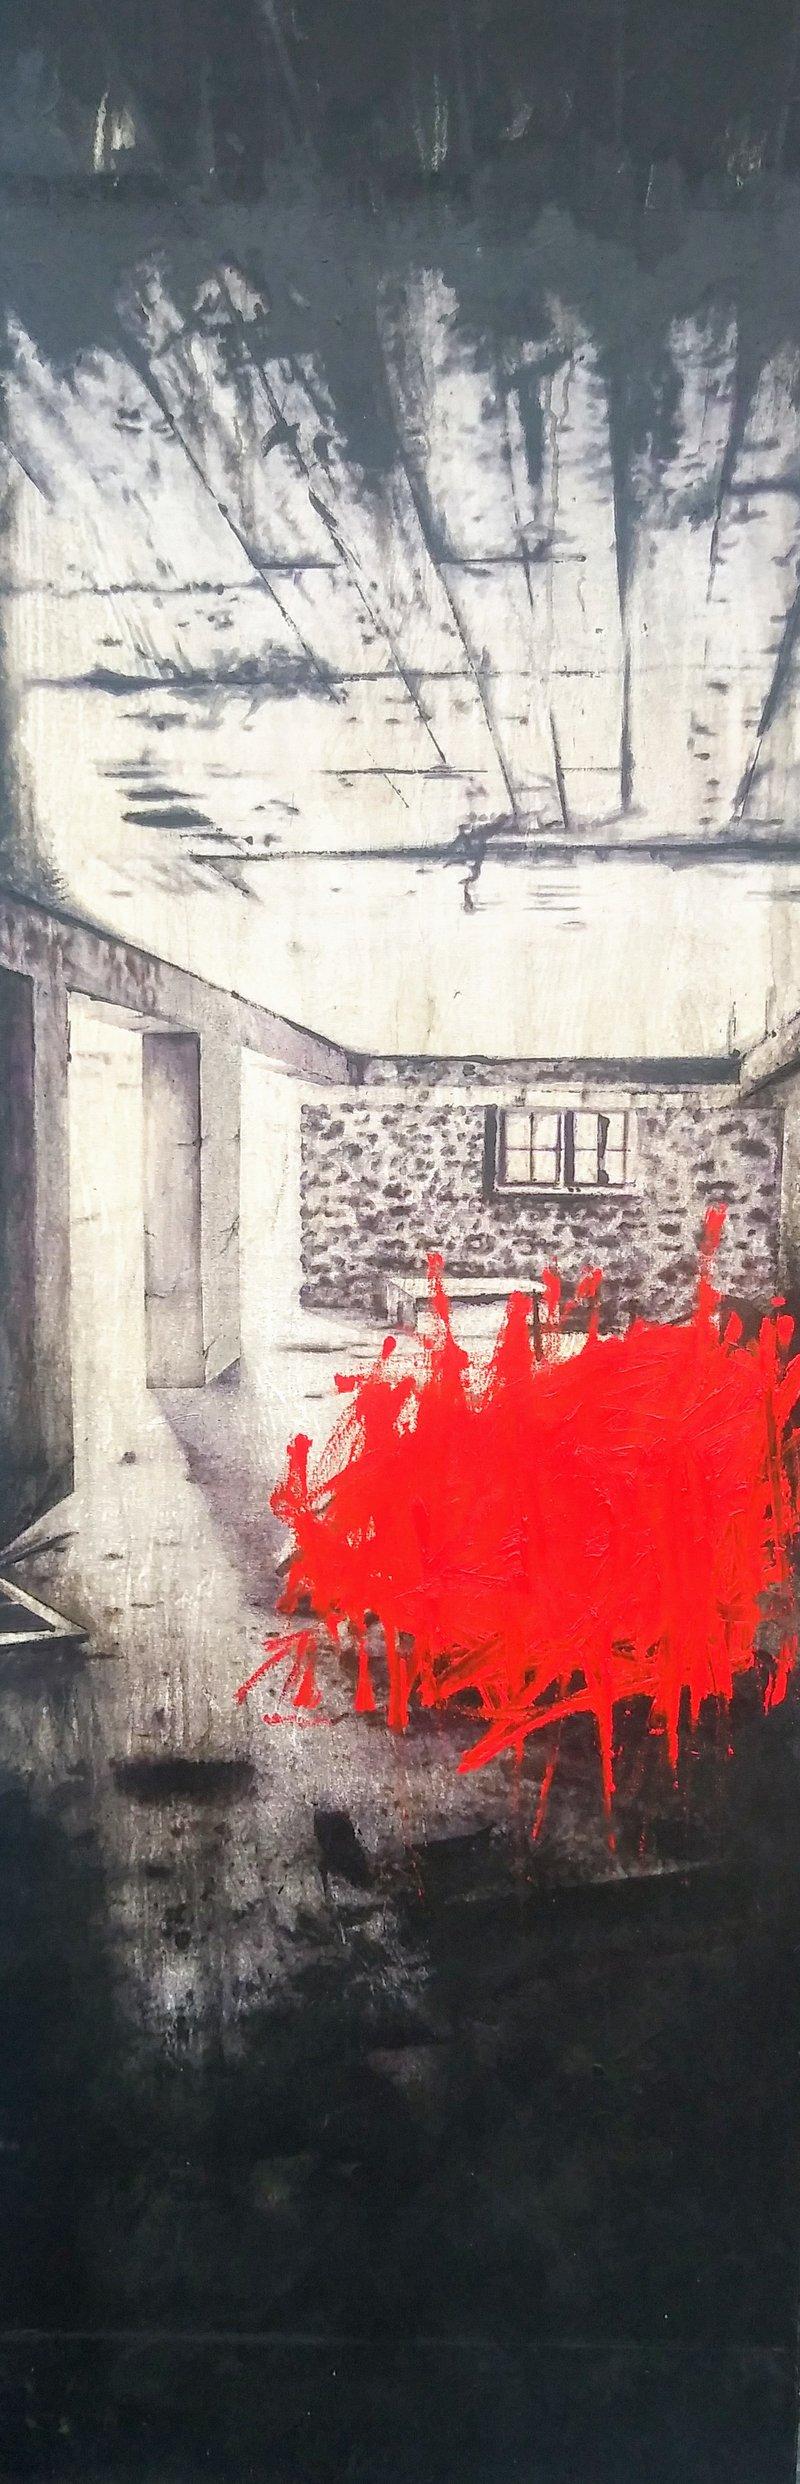 David Celi / explosión  | Celi David